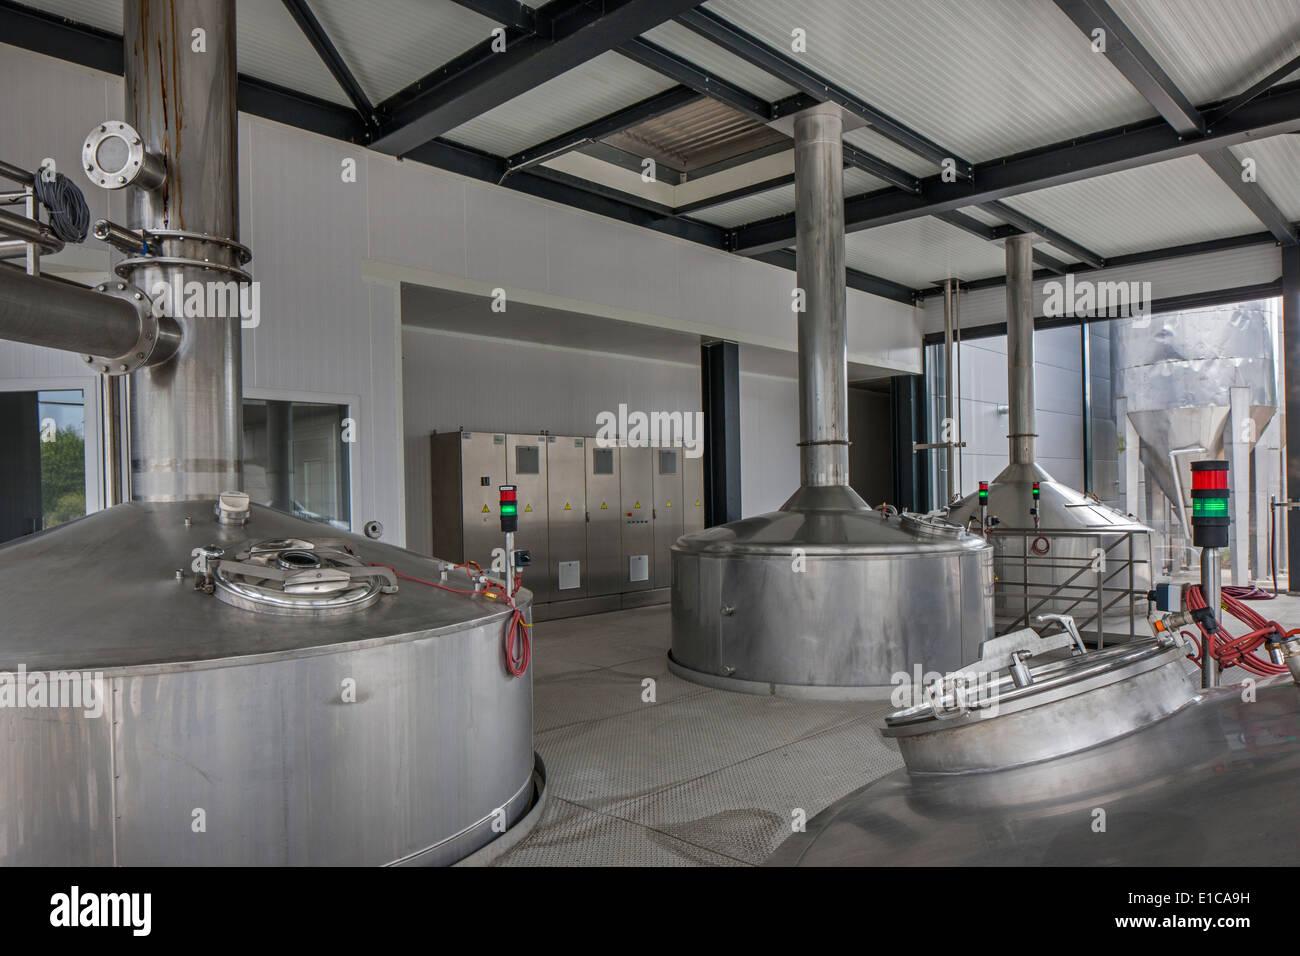 Brew kettles at Brouwerij Boon, Belgian brewery at Lembeek near Brussels, producer of geuze and kriek beer - Stock Image